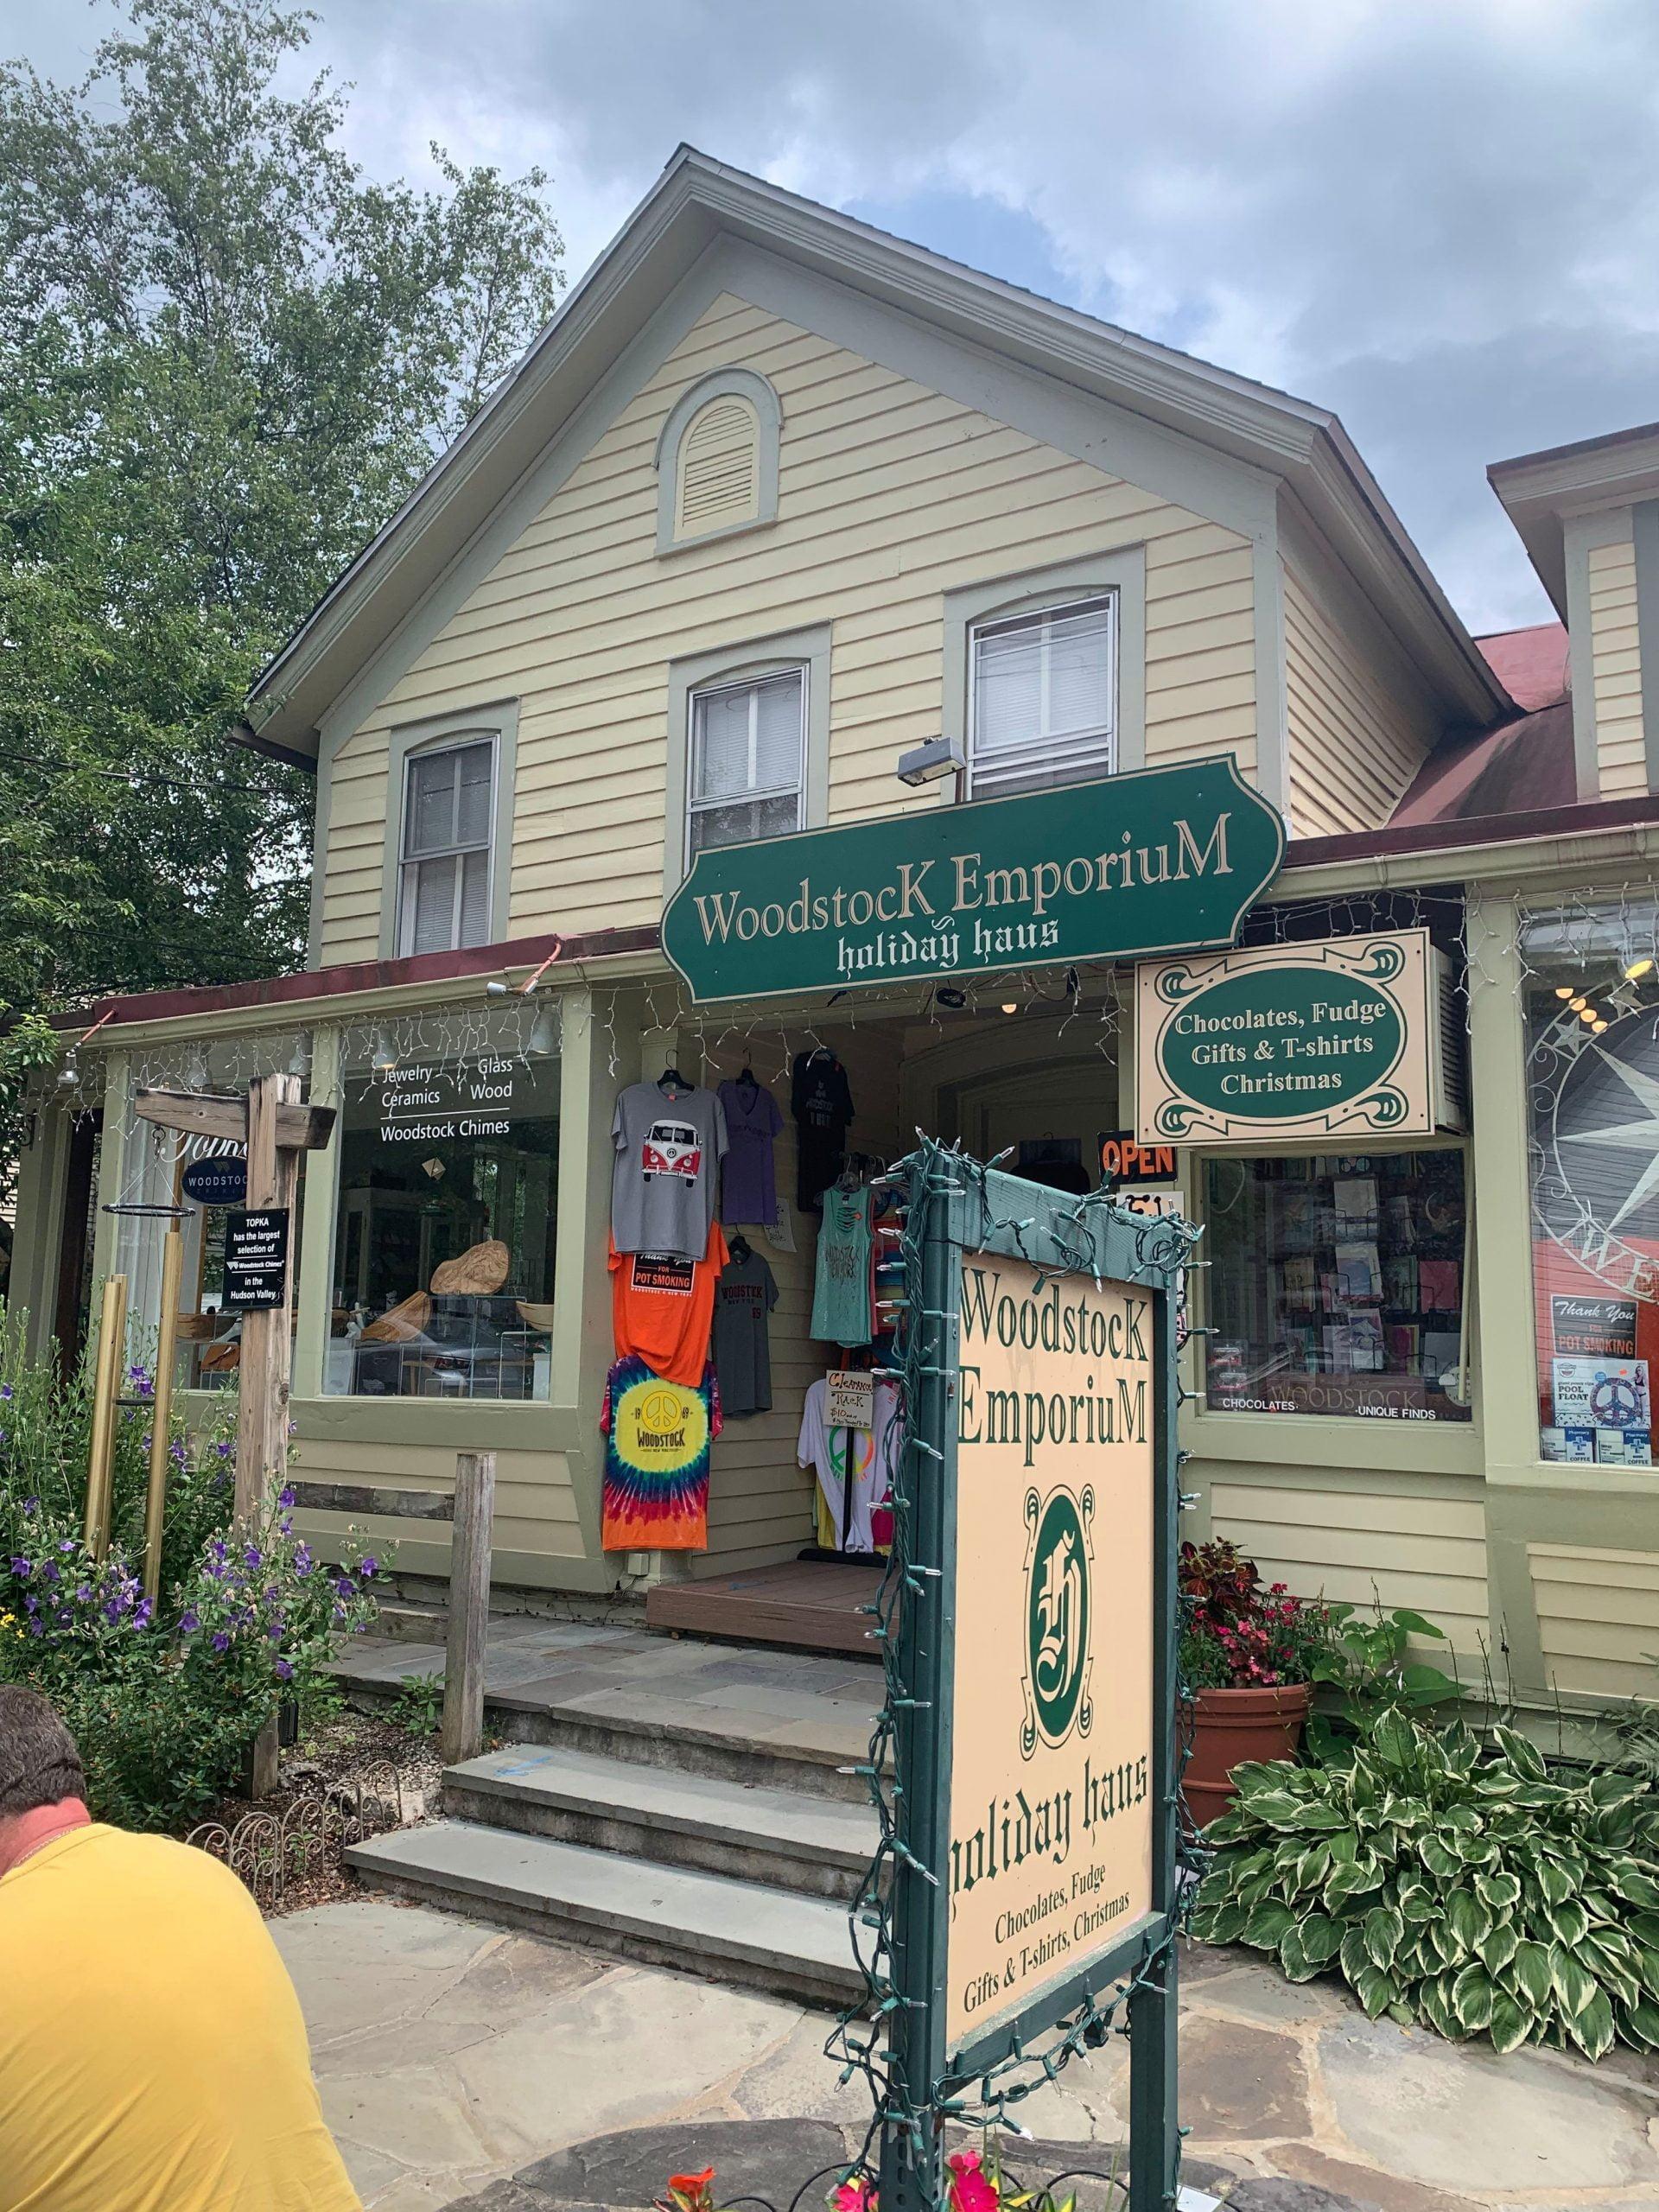 Woodstock Emporium and Christmas Haus